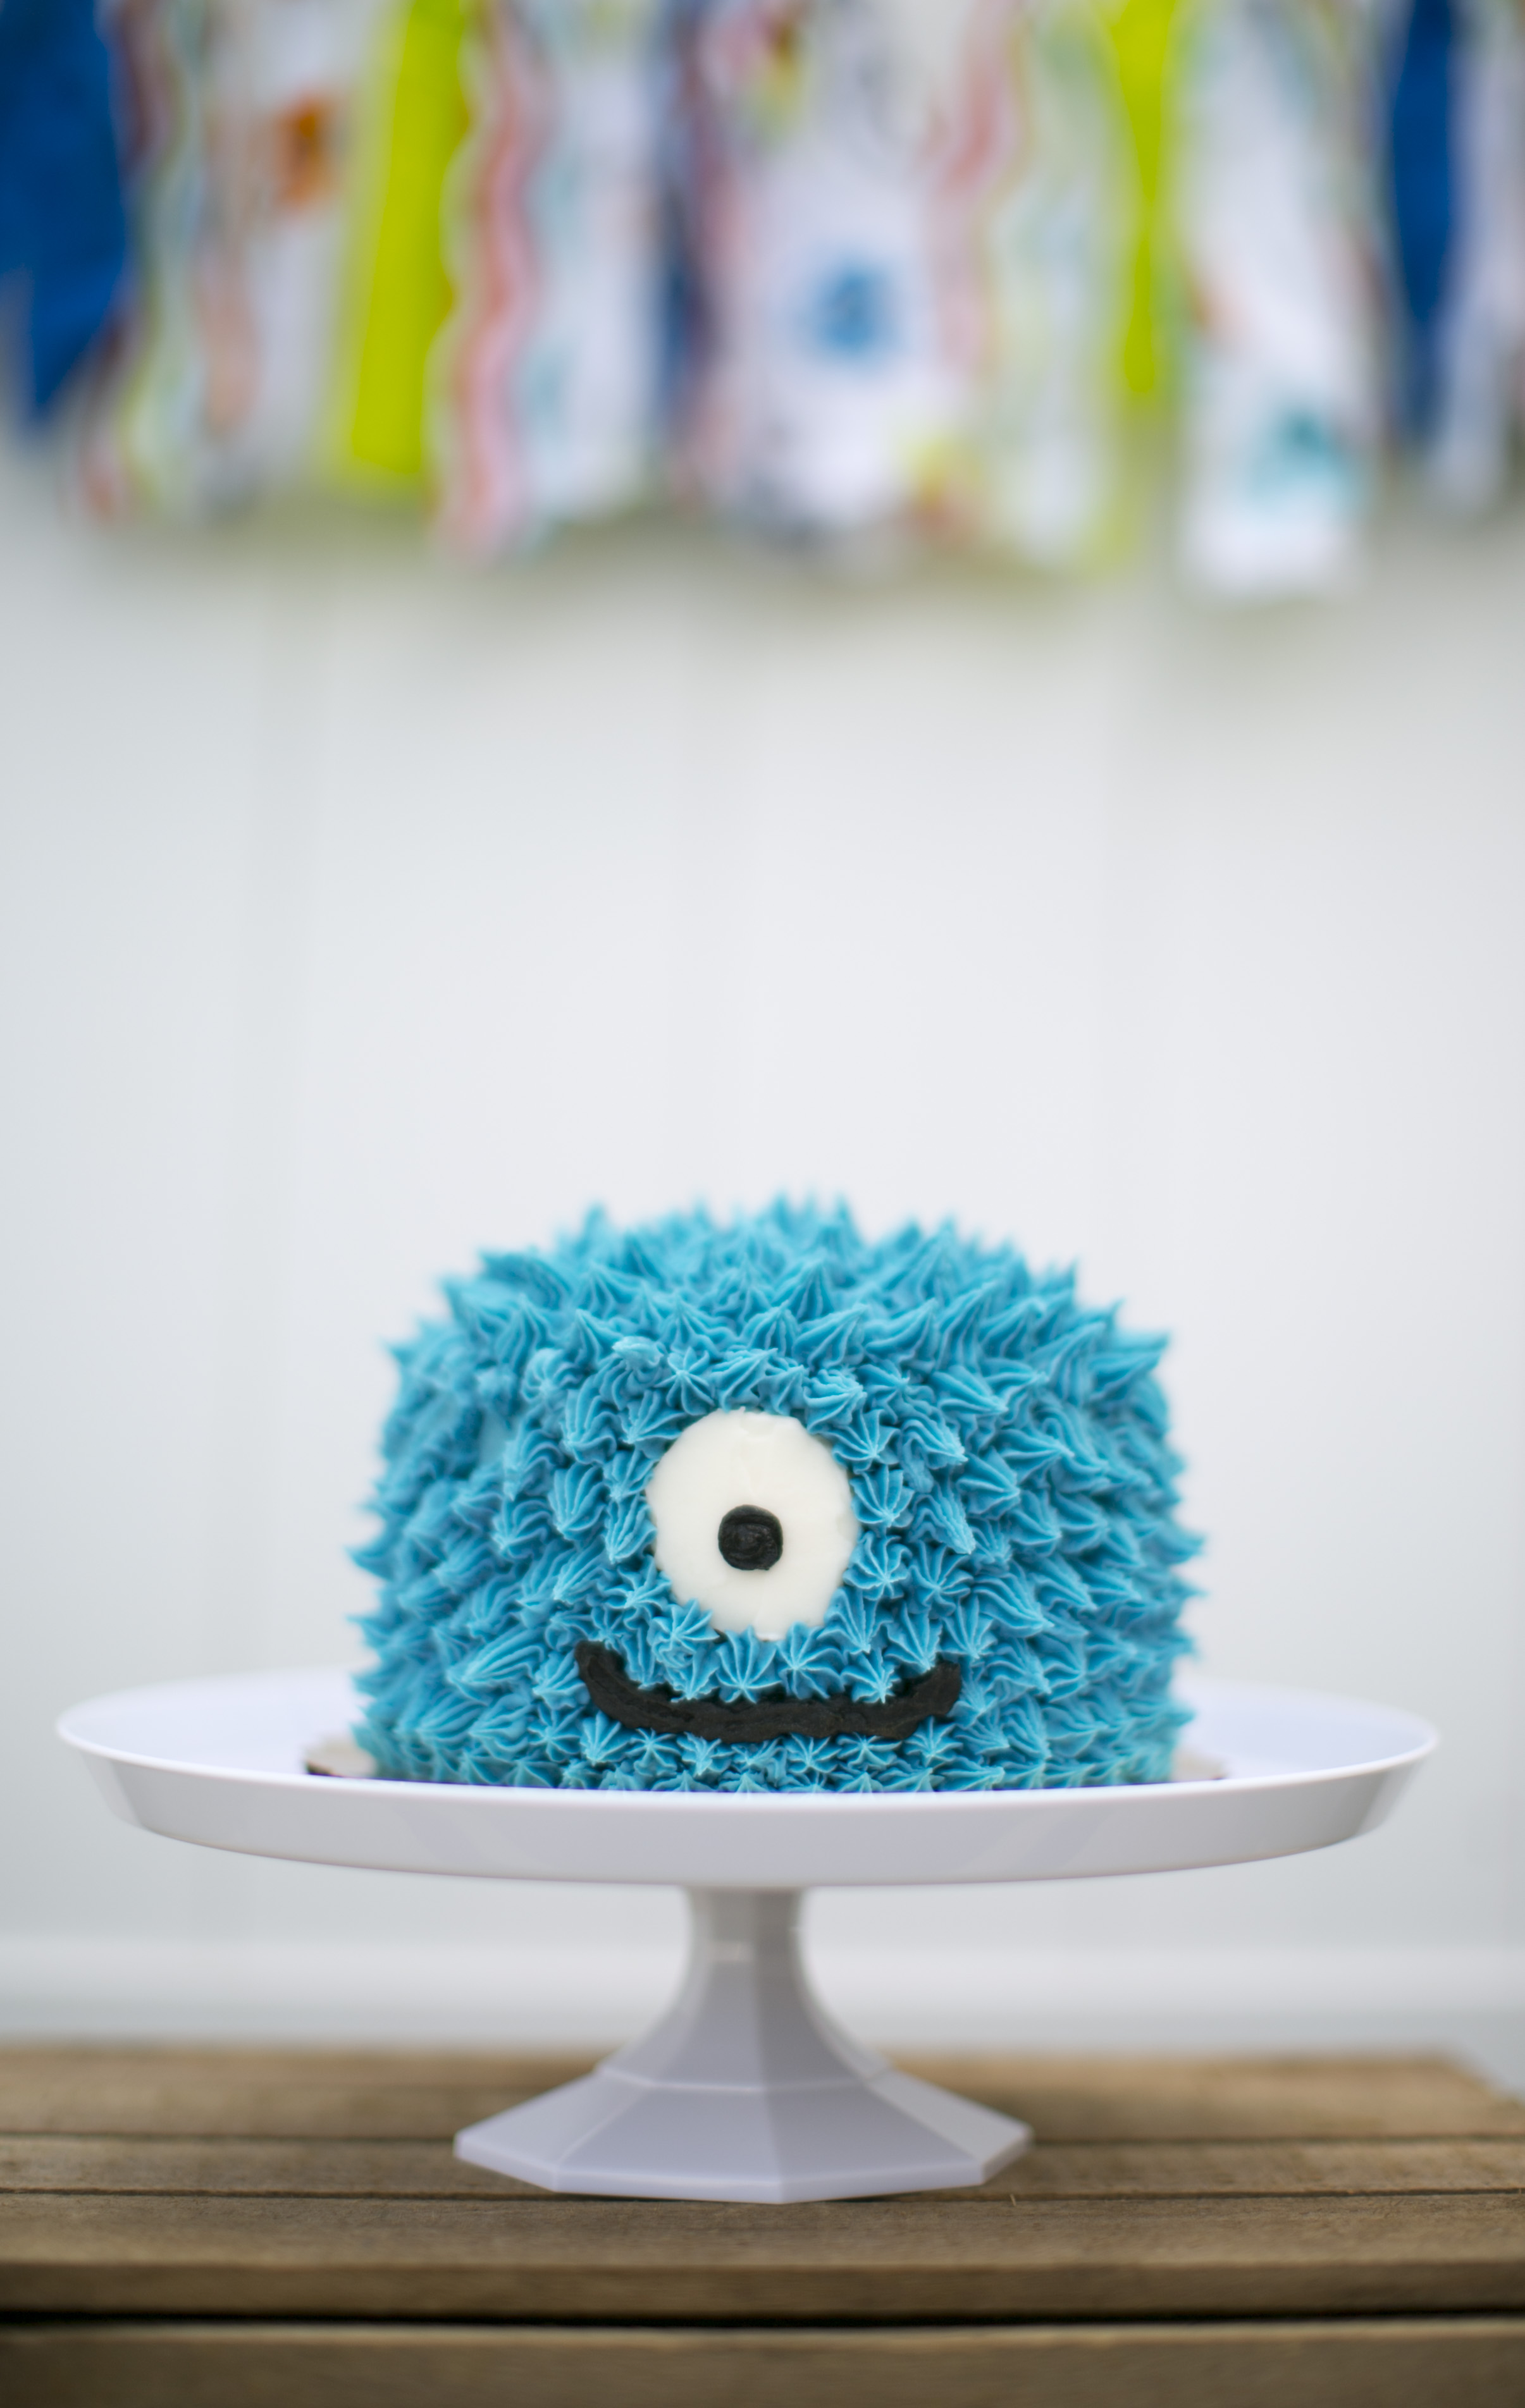 1st Birthday Photo   Cake Smashing   Jess Rudolph Photography: www.jessrudolph.com